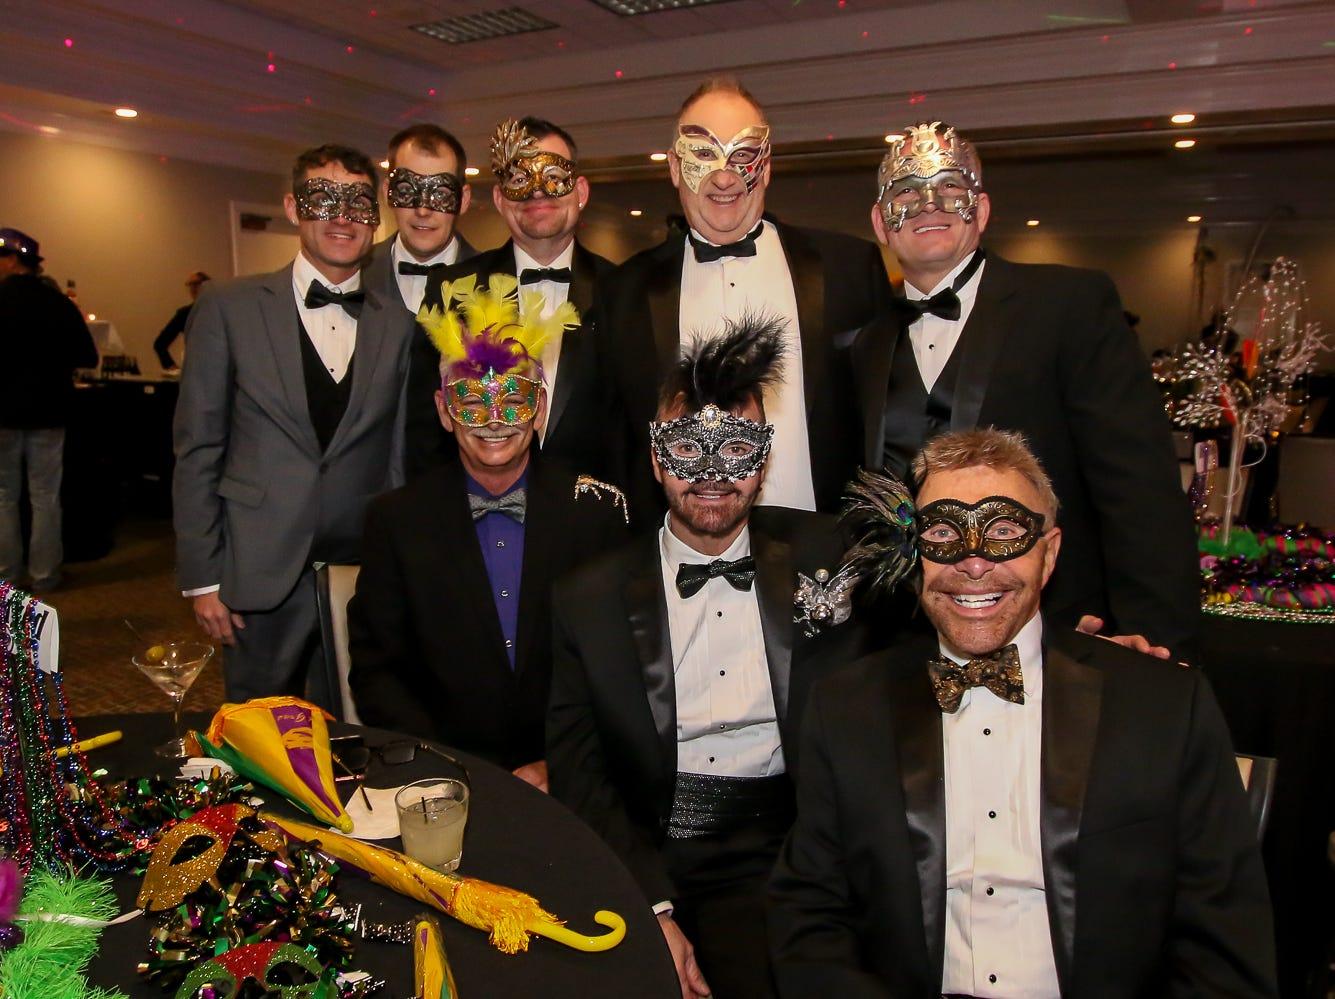 People enjoy Evolve 'n Thrive's inaugural Gay...la Masquerade Ball at the Pensacola Grand Hotel on Saturday, January 19, 2019.